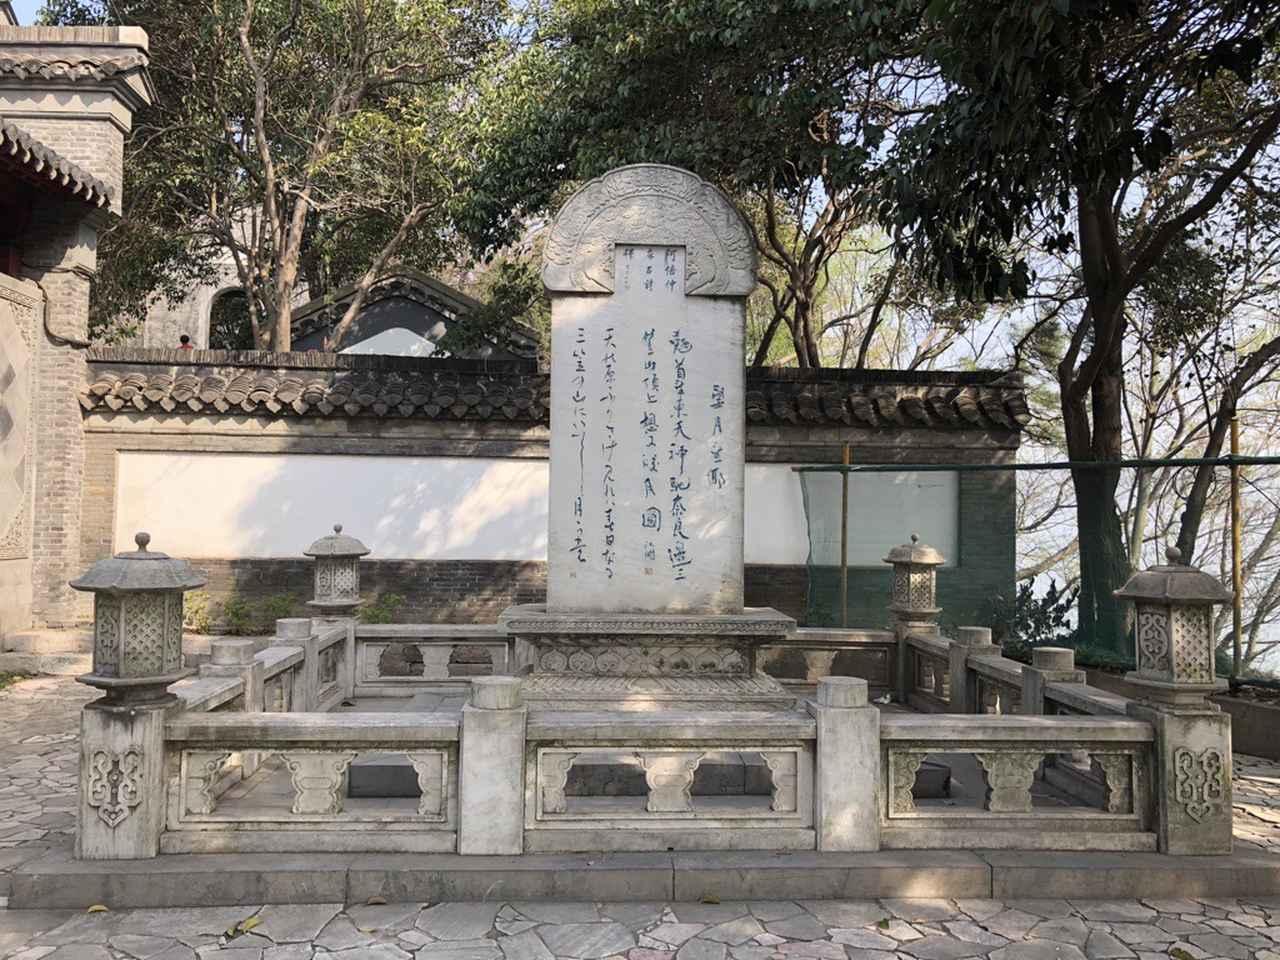 画像: 北固山公園・阿倍仲麻呂詩碑(イメージ)